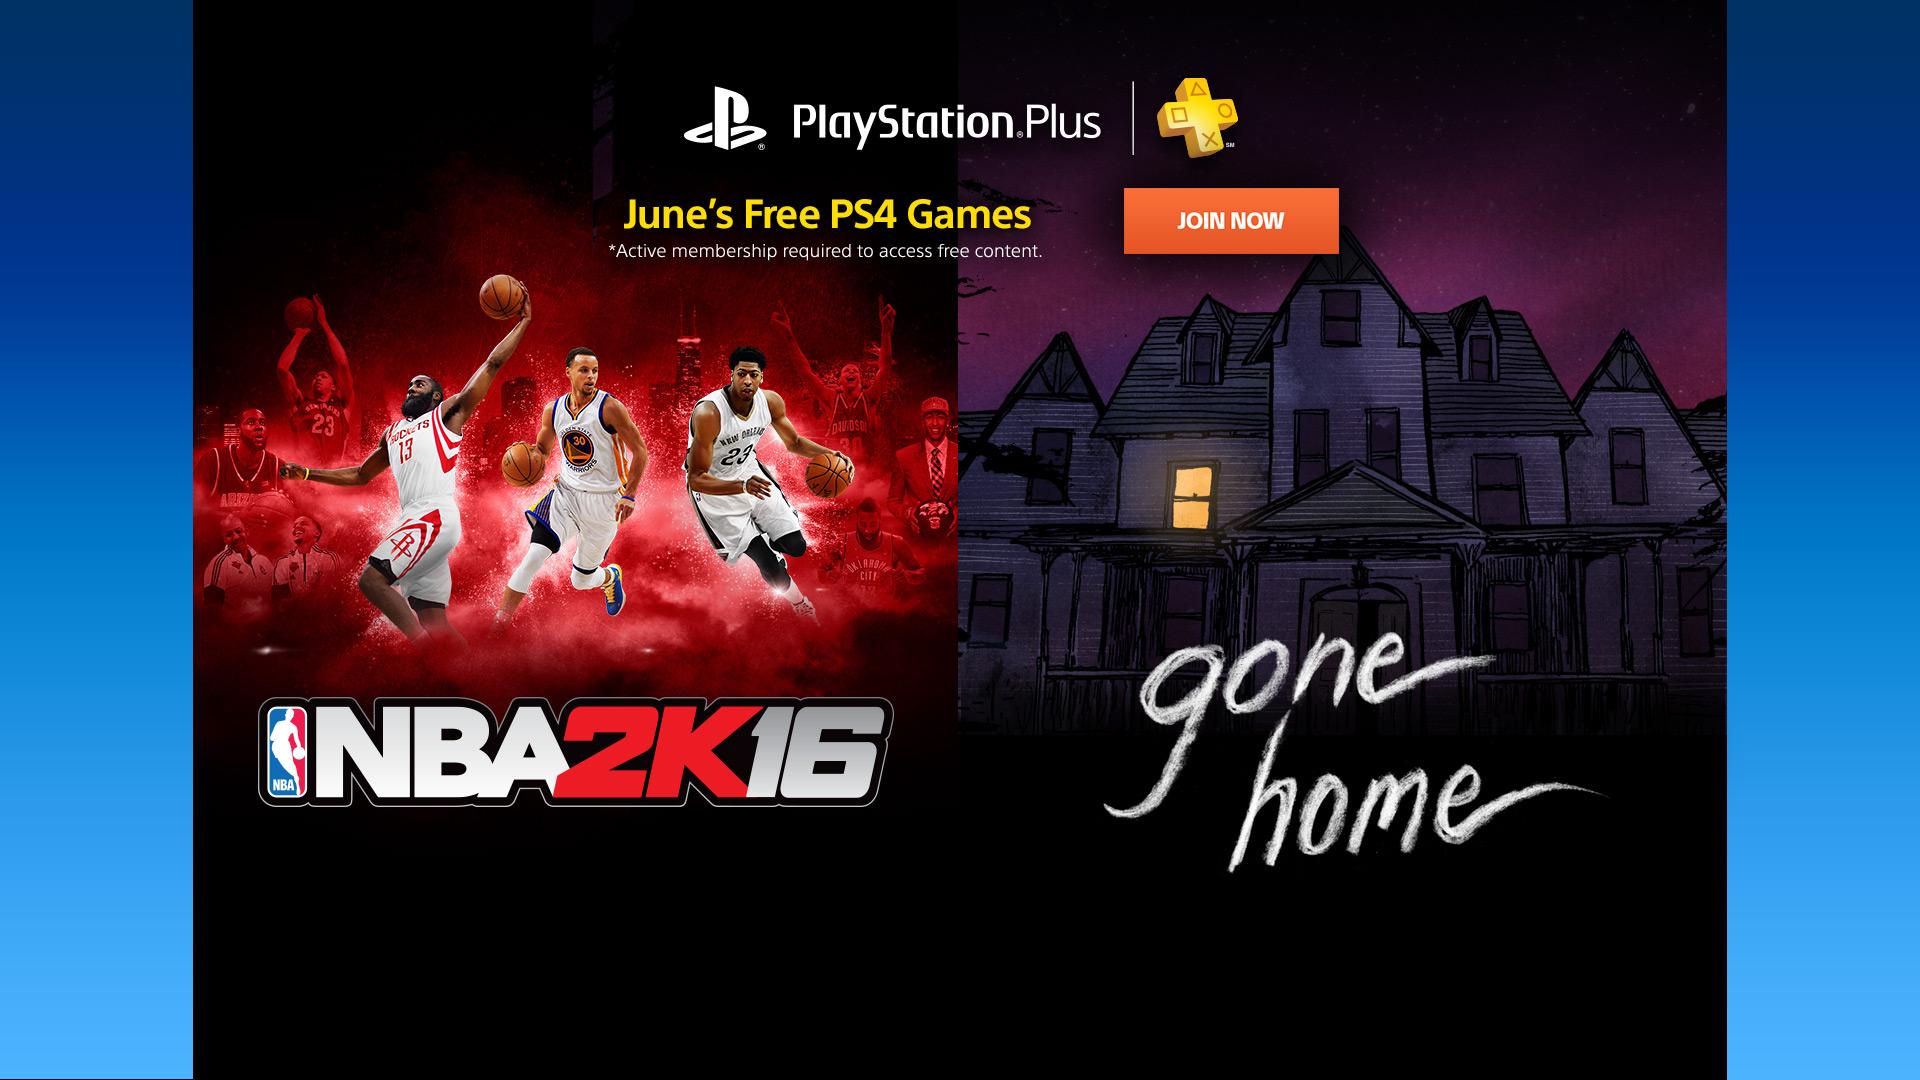 NBA και Gone Home στα δωρεάν παιχνίδια του PS Plus τον Ιούνιο Plus